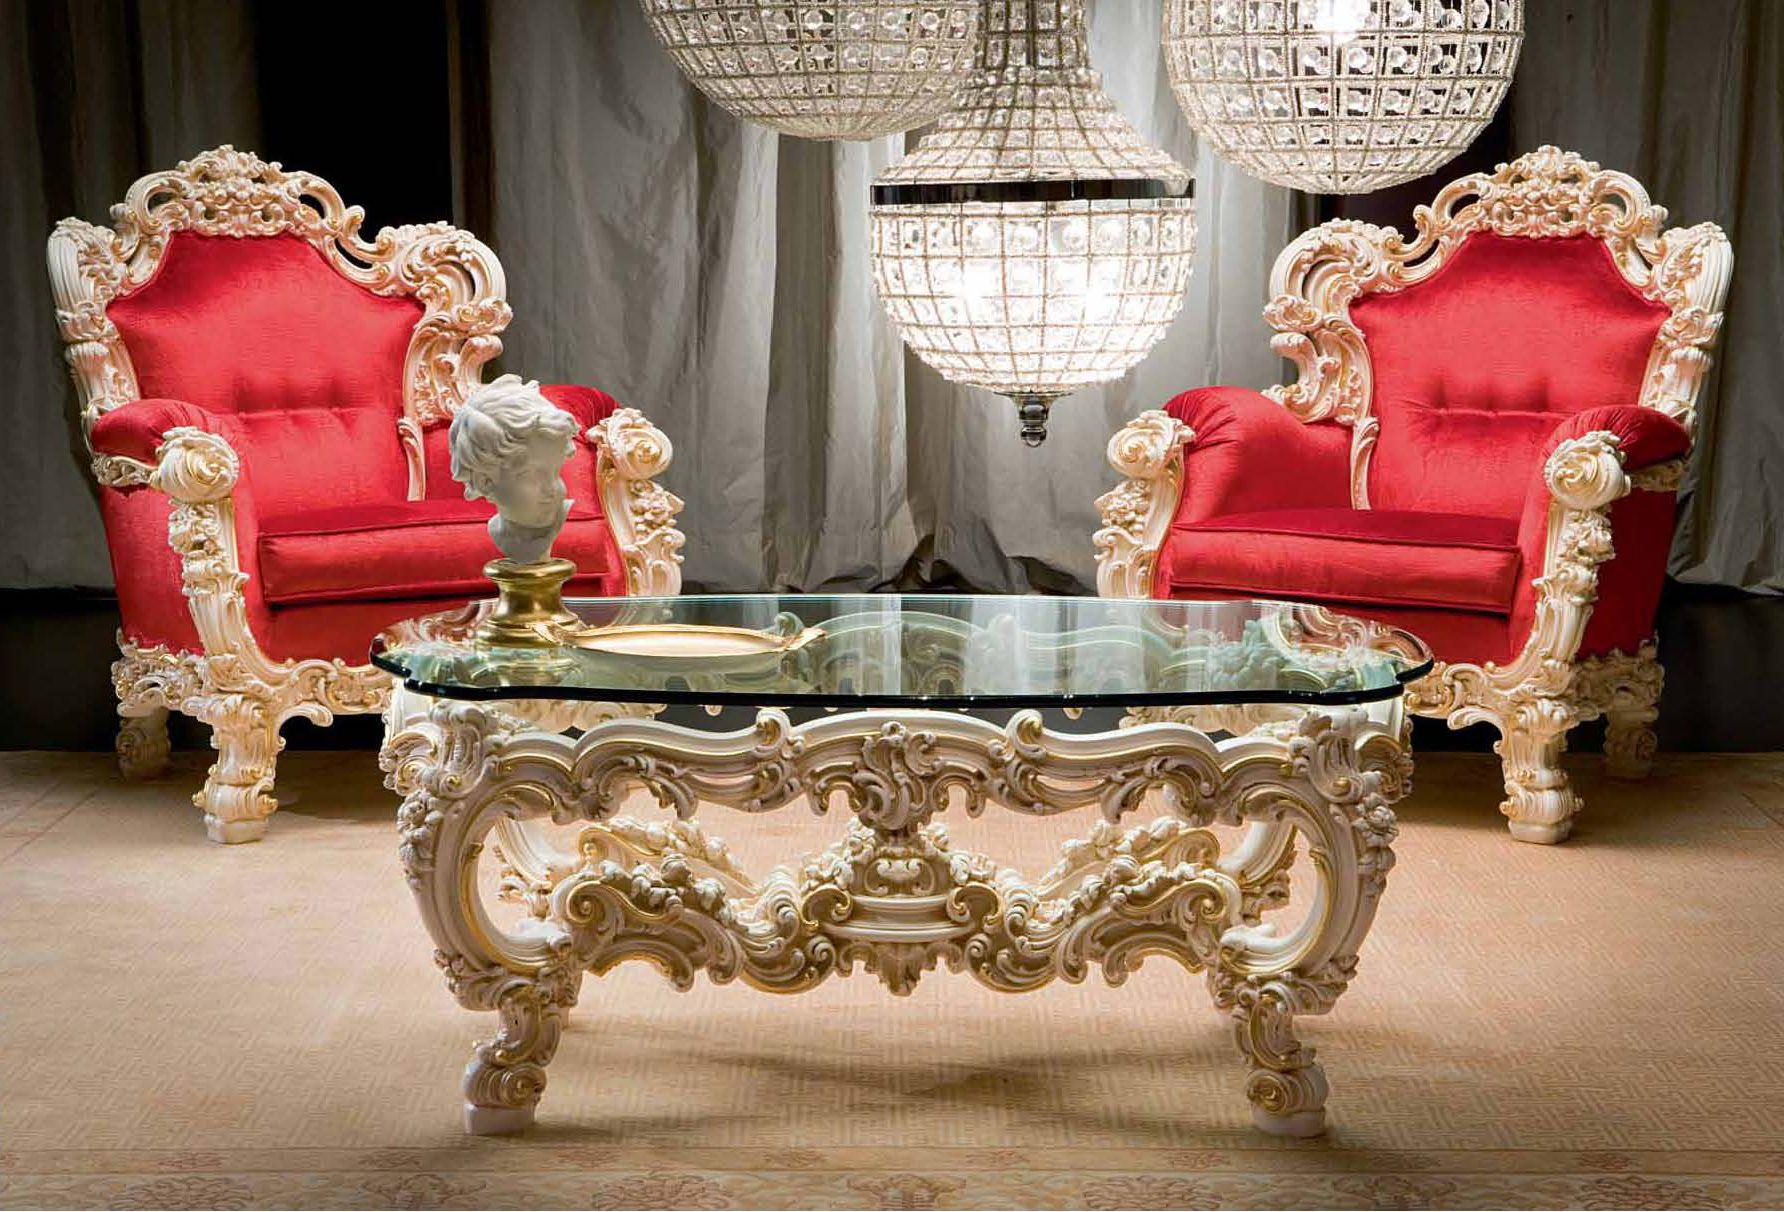 luxus-möbel - luxus möbel serie silik orfeodie möbel aus italien, Hause ideen